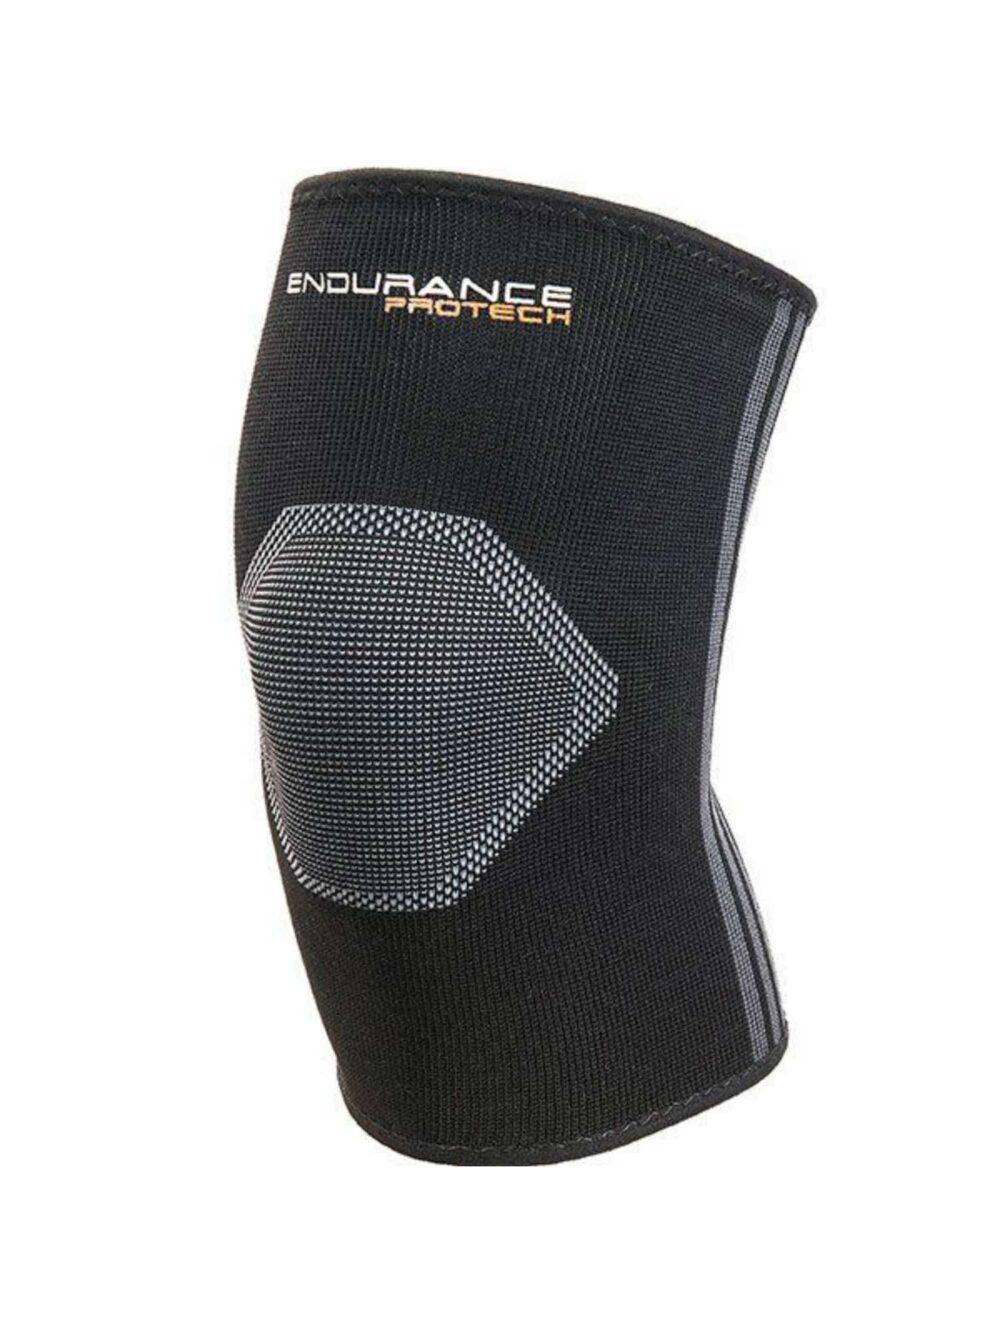 Endurance Protech Knee Compression